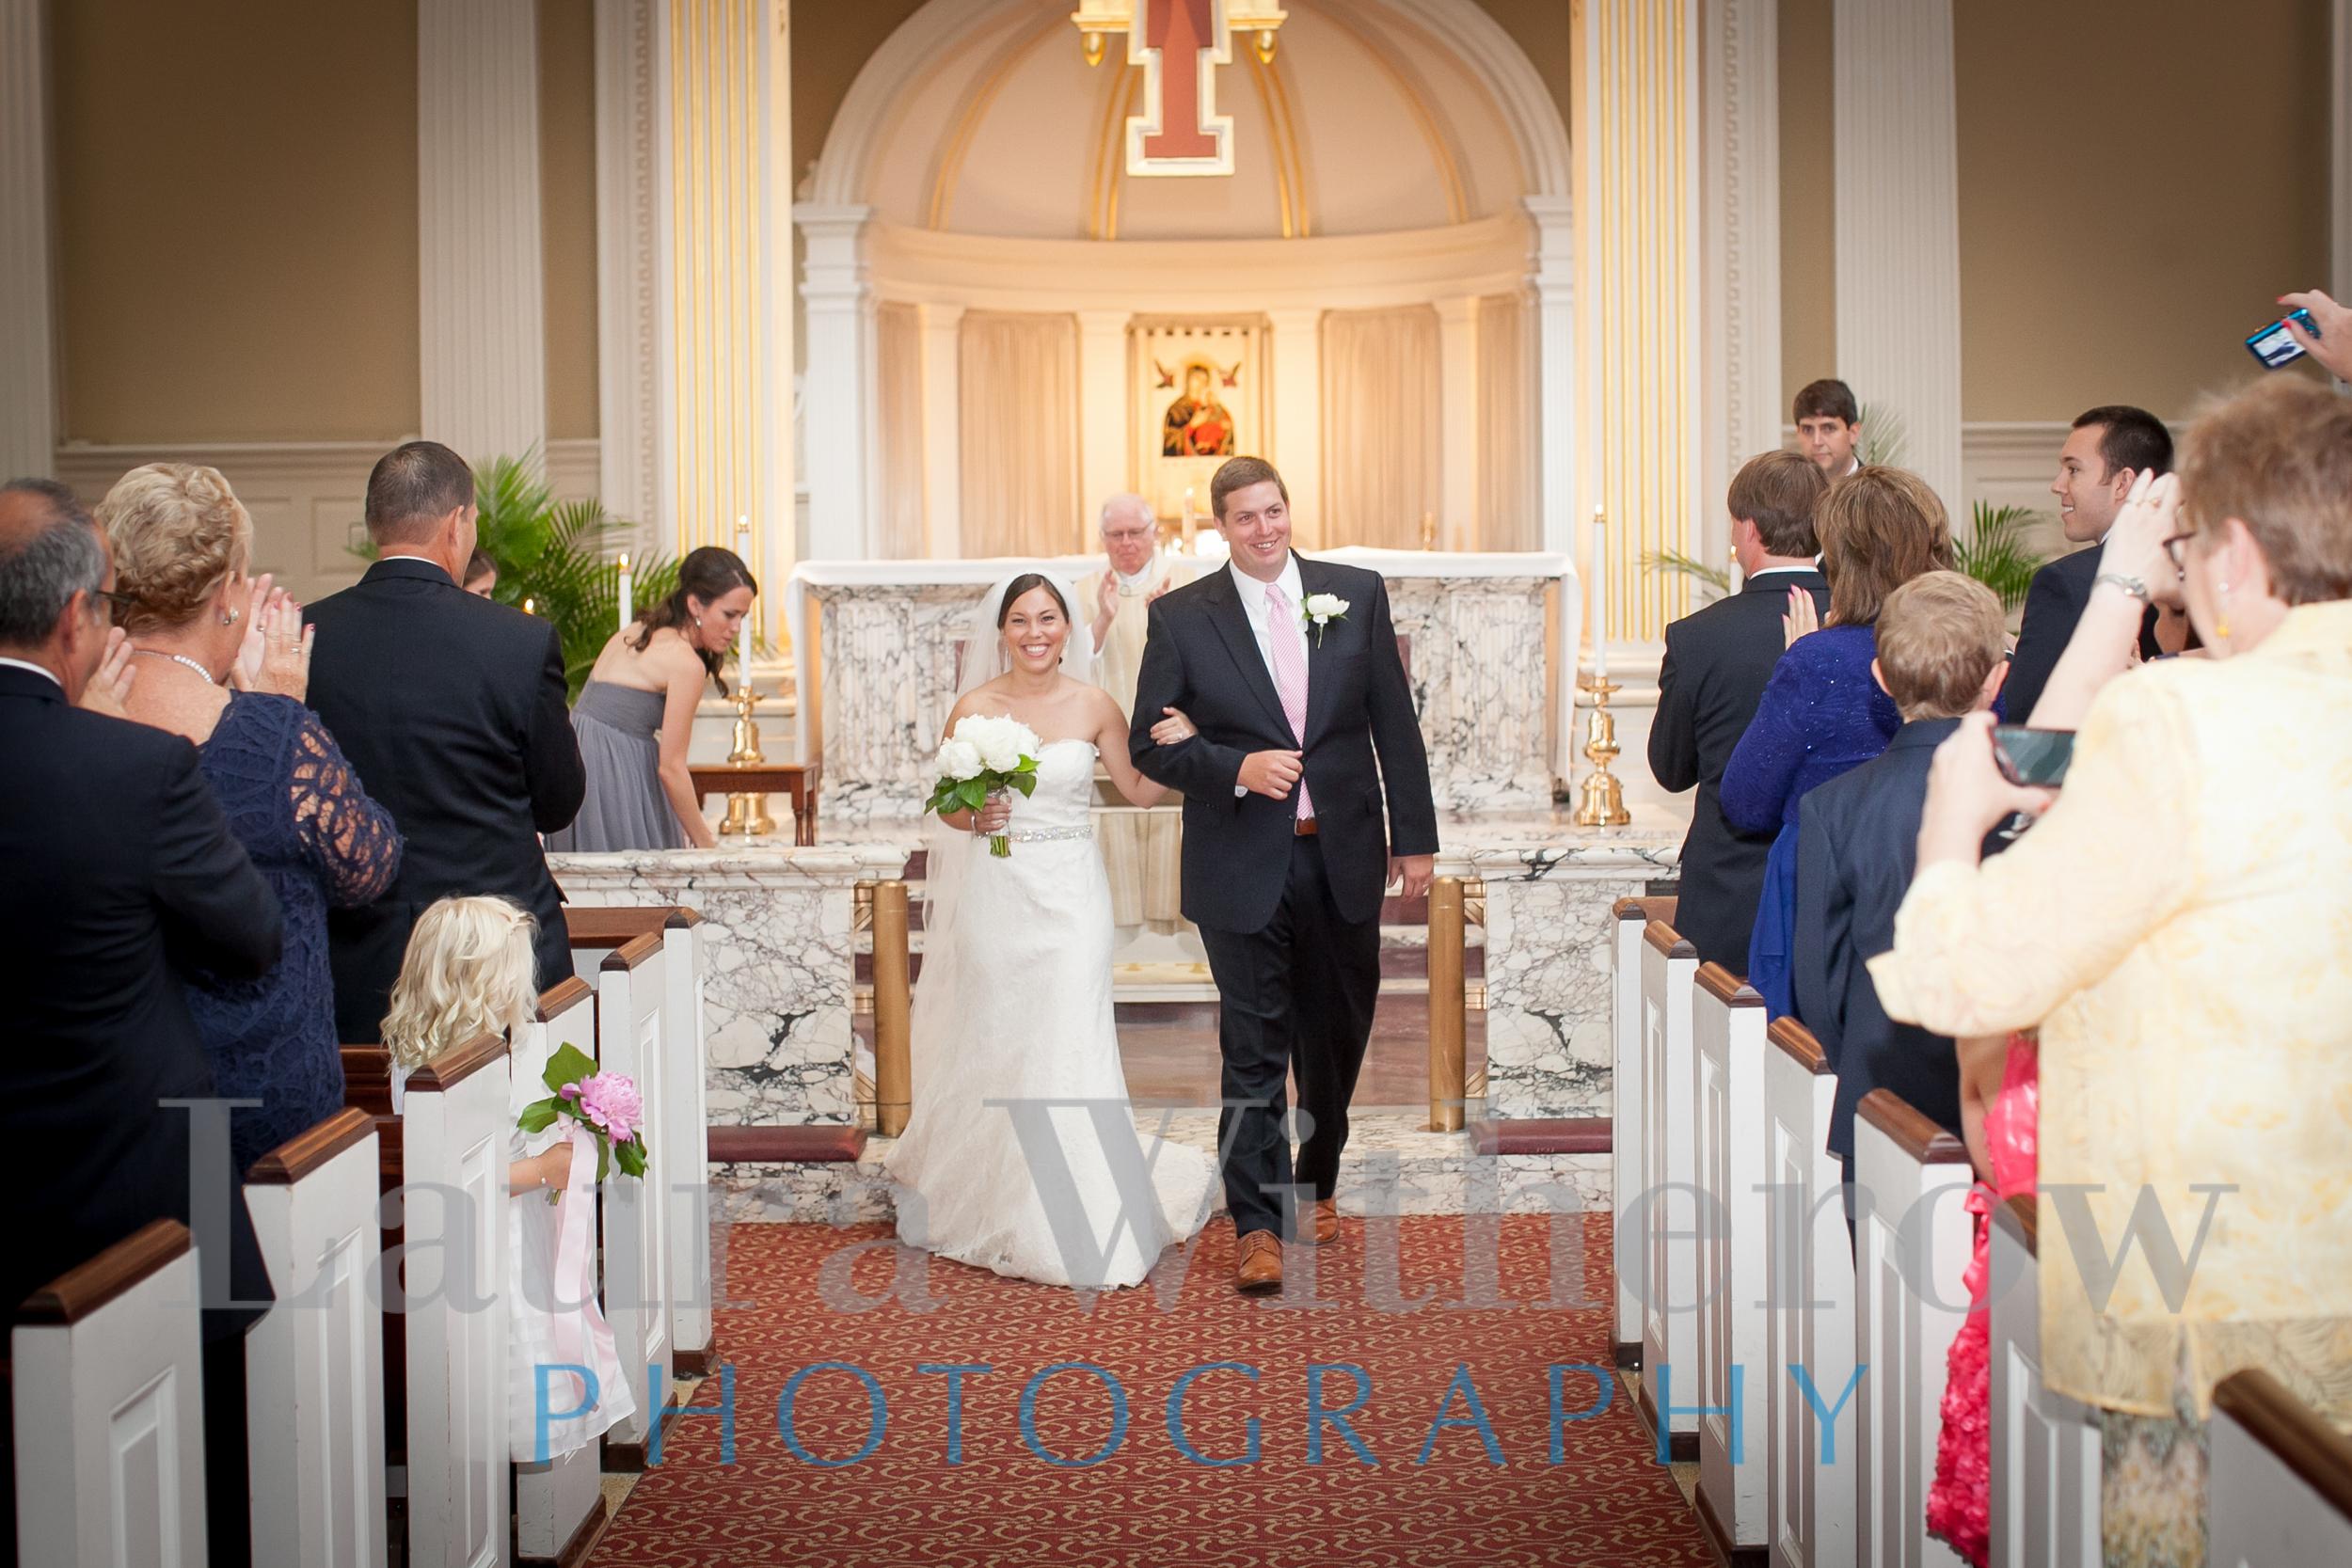 wedding-ceremony-OLPH.jpg